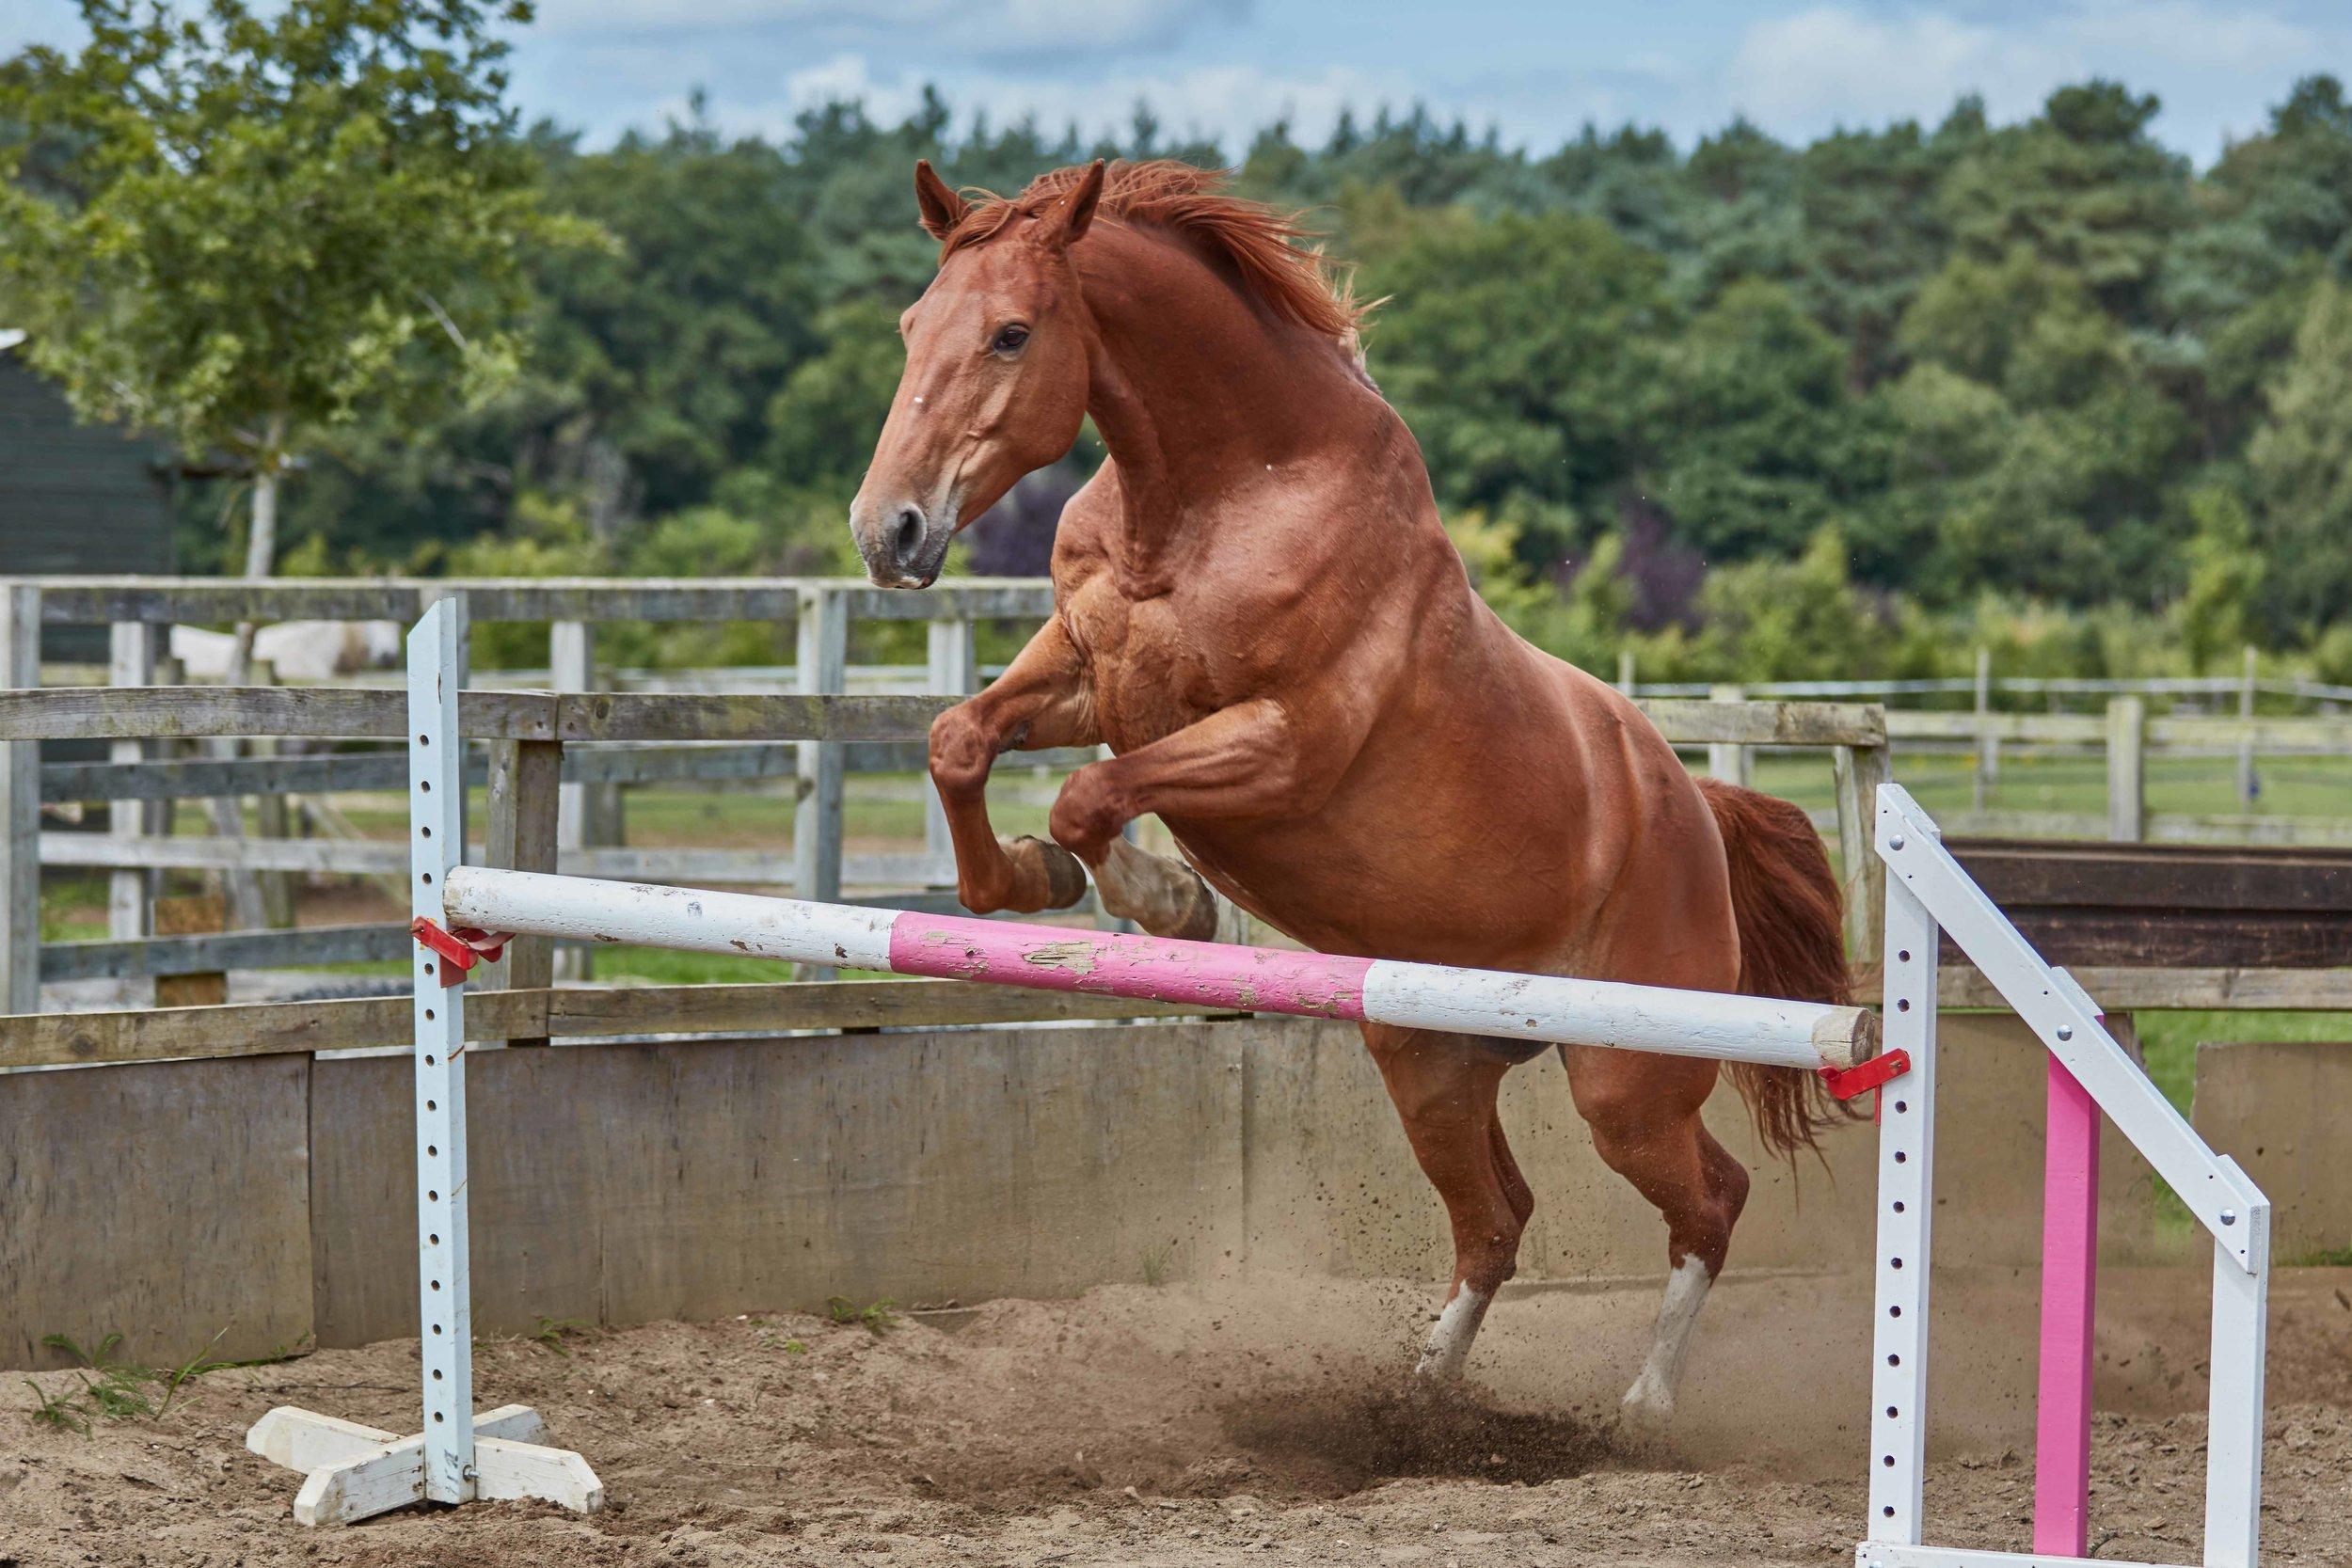 Khailun Lir Rehman Horse Riding School - Islamabad,Tilford, U.K.